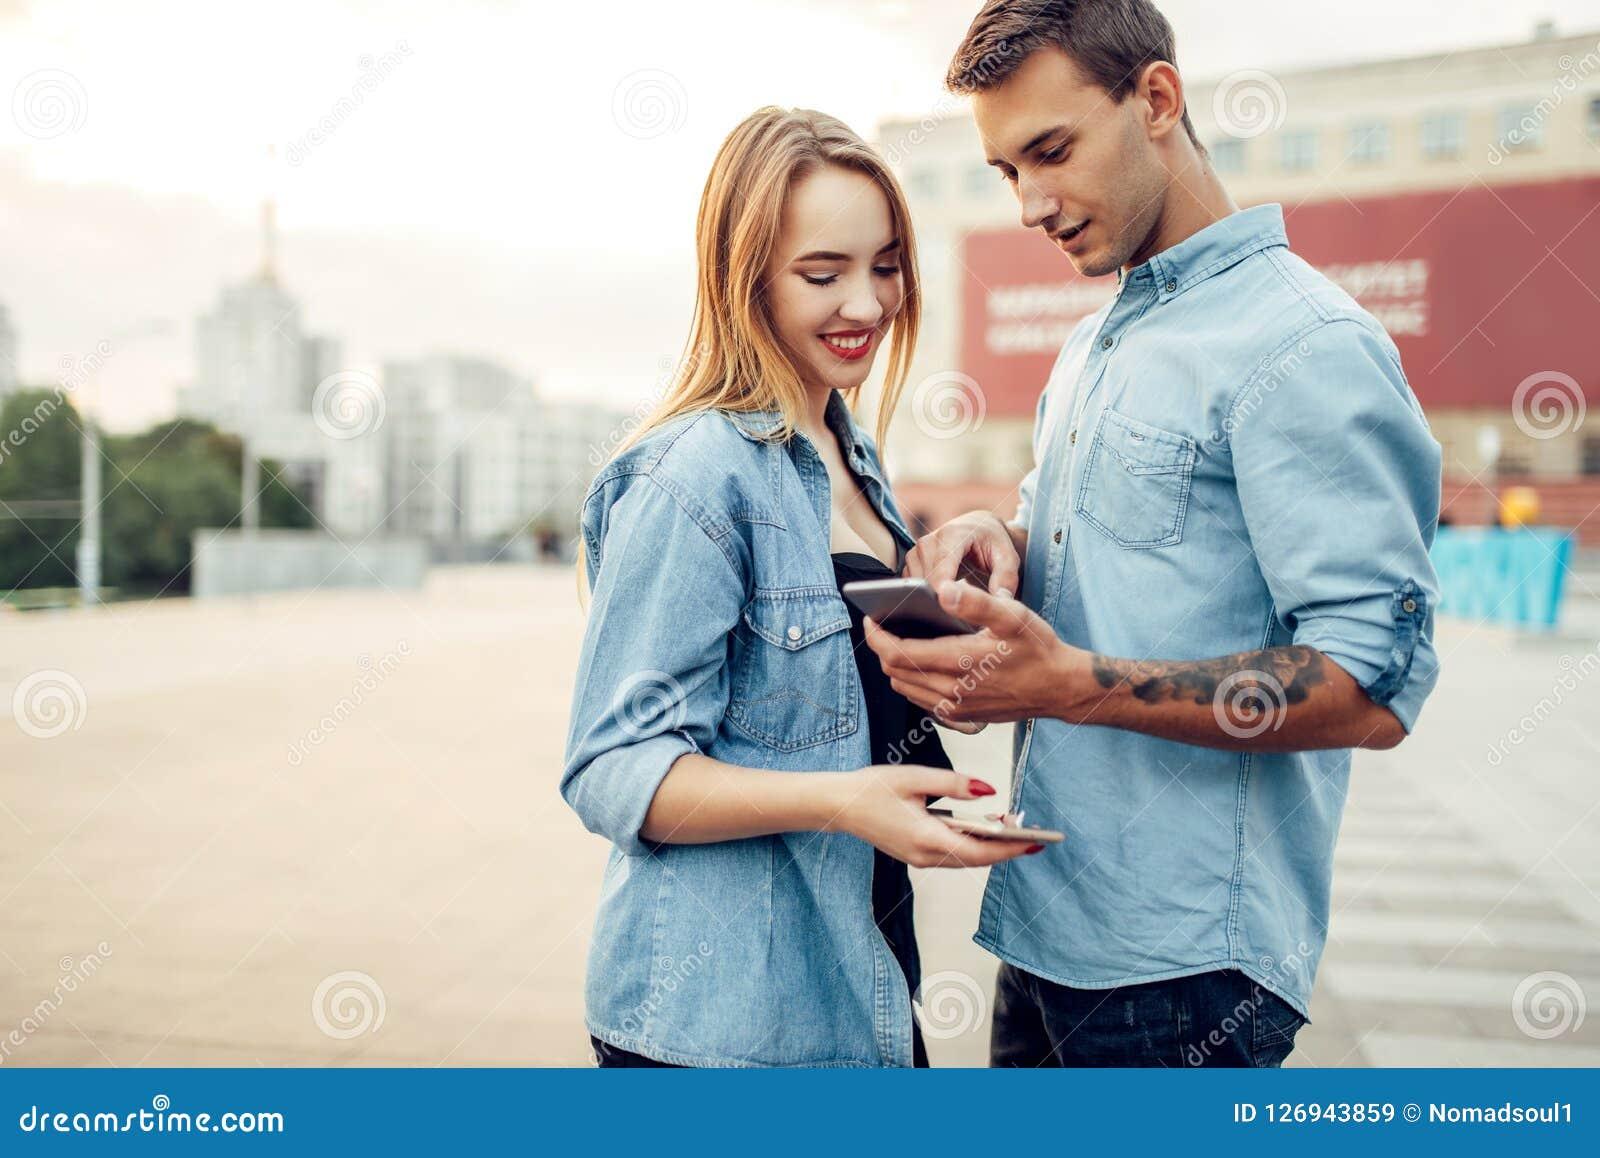 lds free dating websites